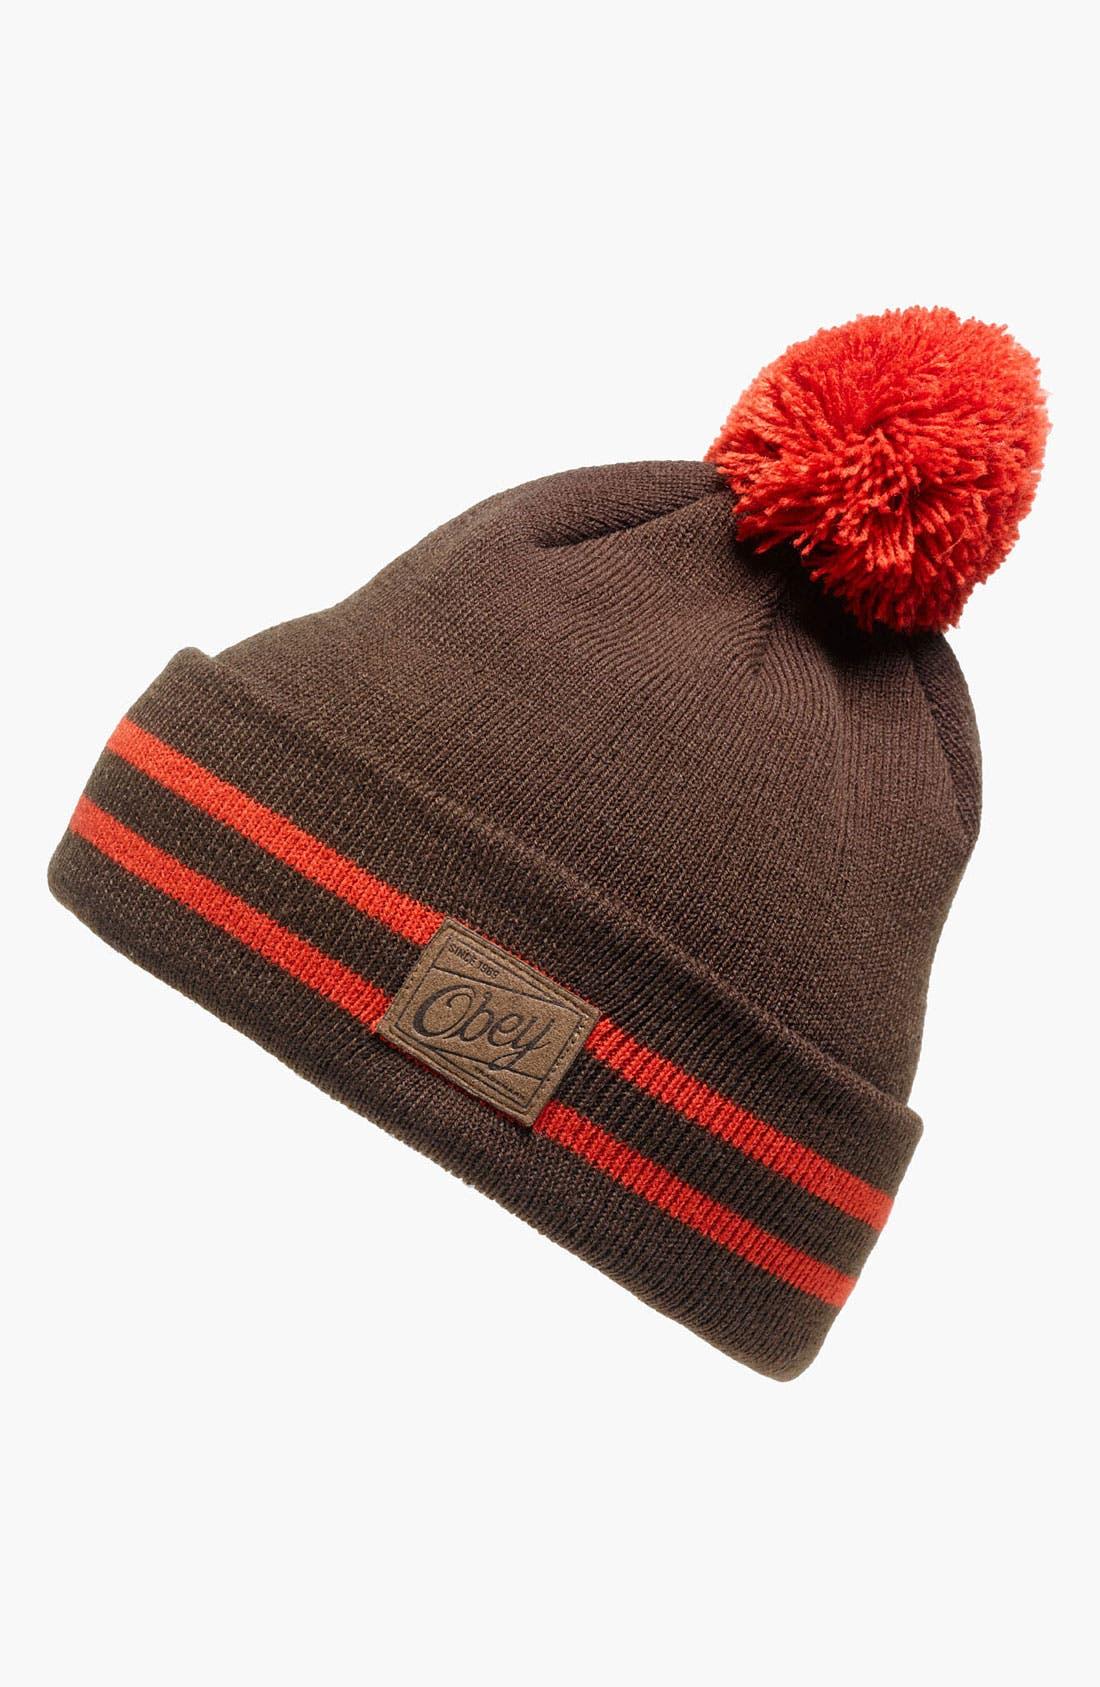 Main Image - Obey 'Tilden' Knit Cap